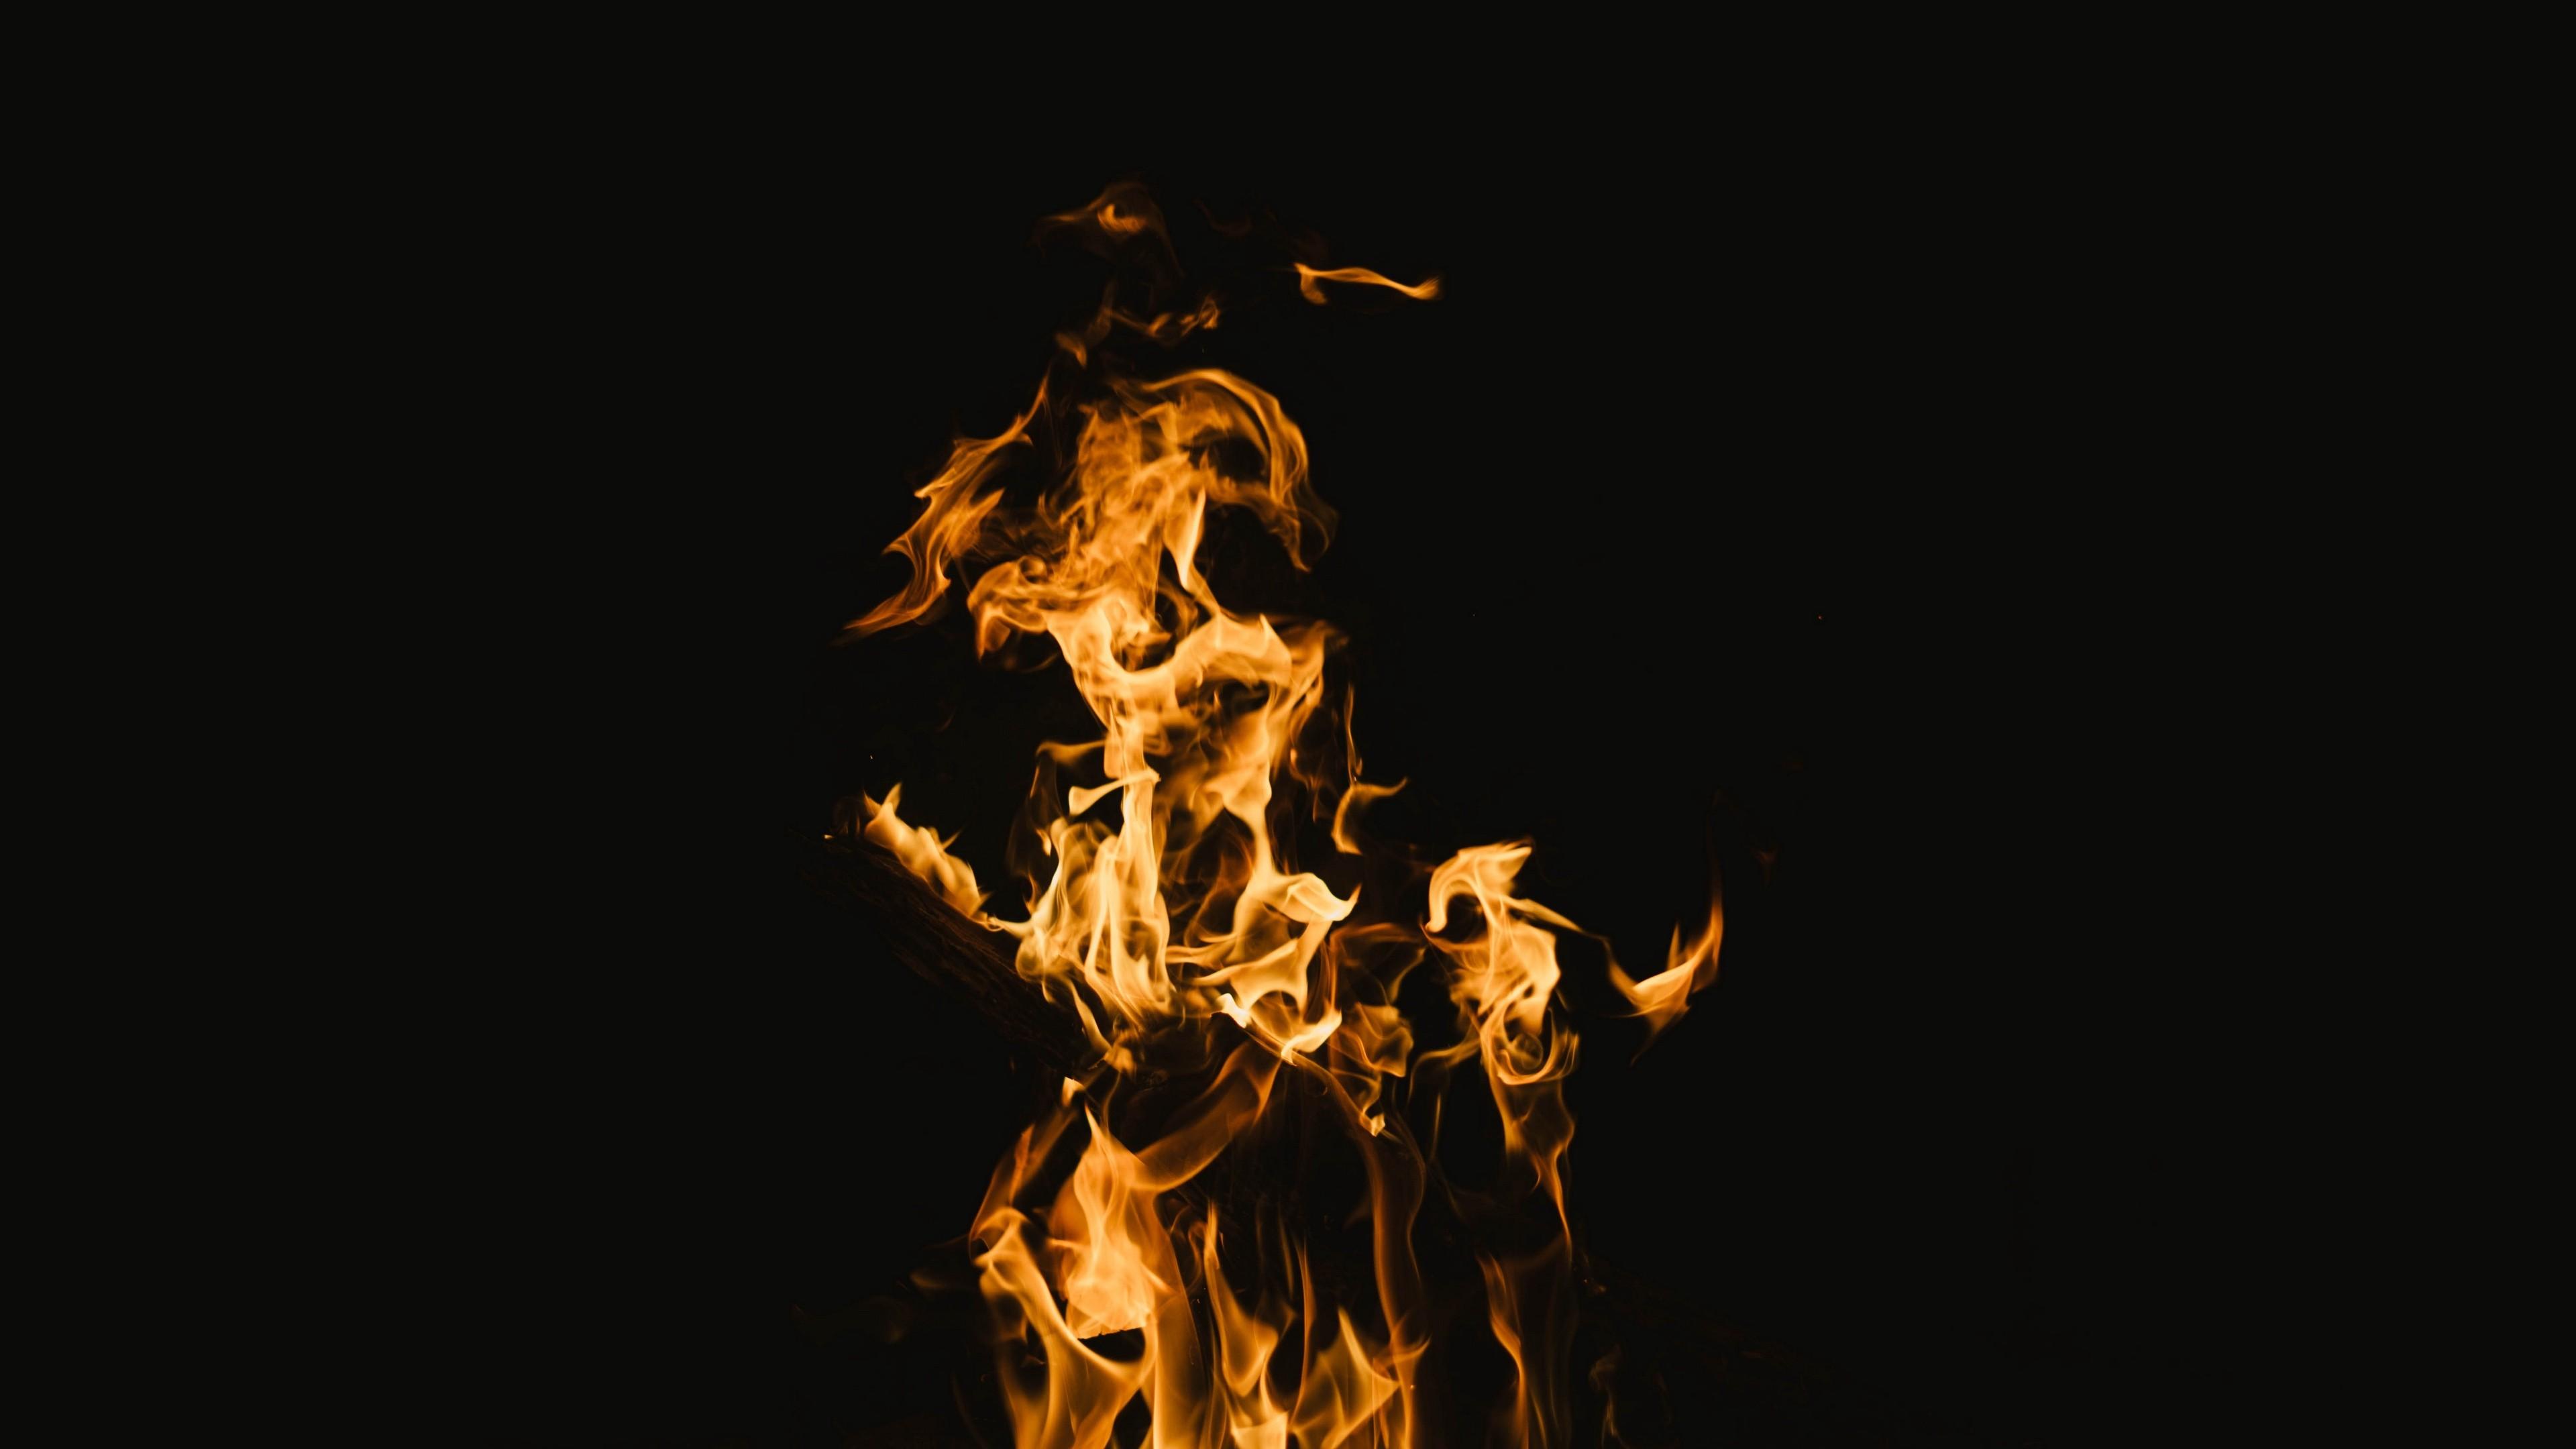 4k Fire Flame Burn Wallpaper 3840x2160